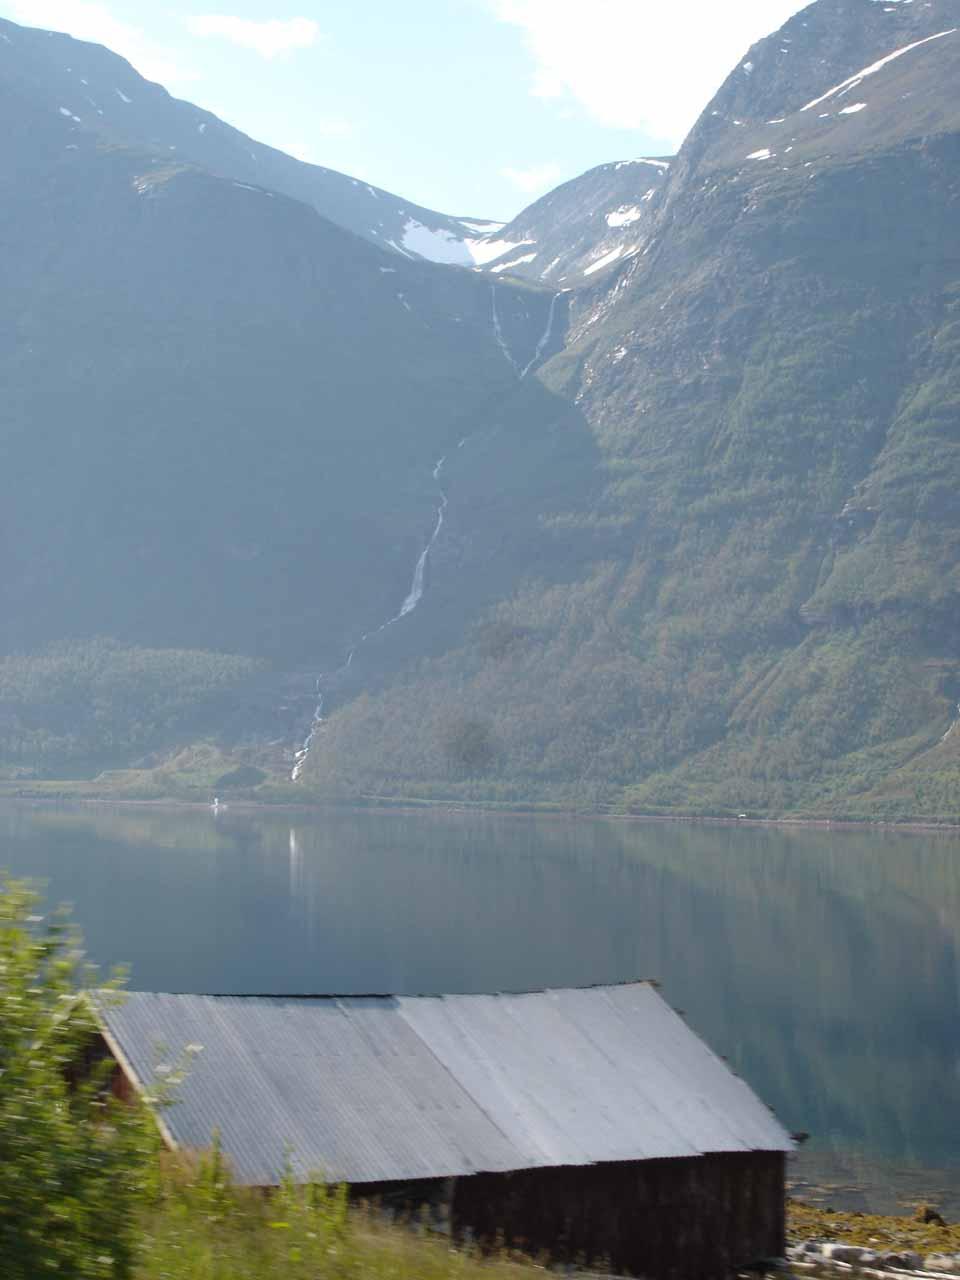 Looking over this tin-roofed house along Kåfjorden towards this waterfall I believe is on the Båelva (Båfossen?)